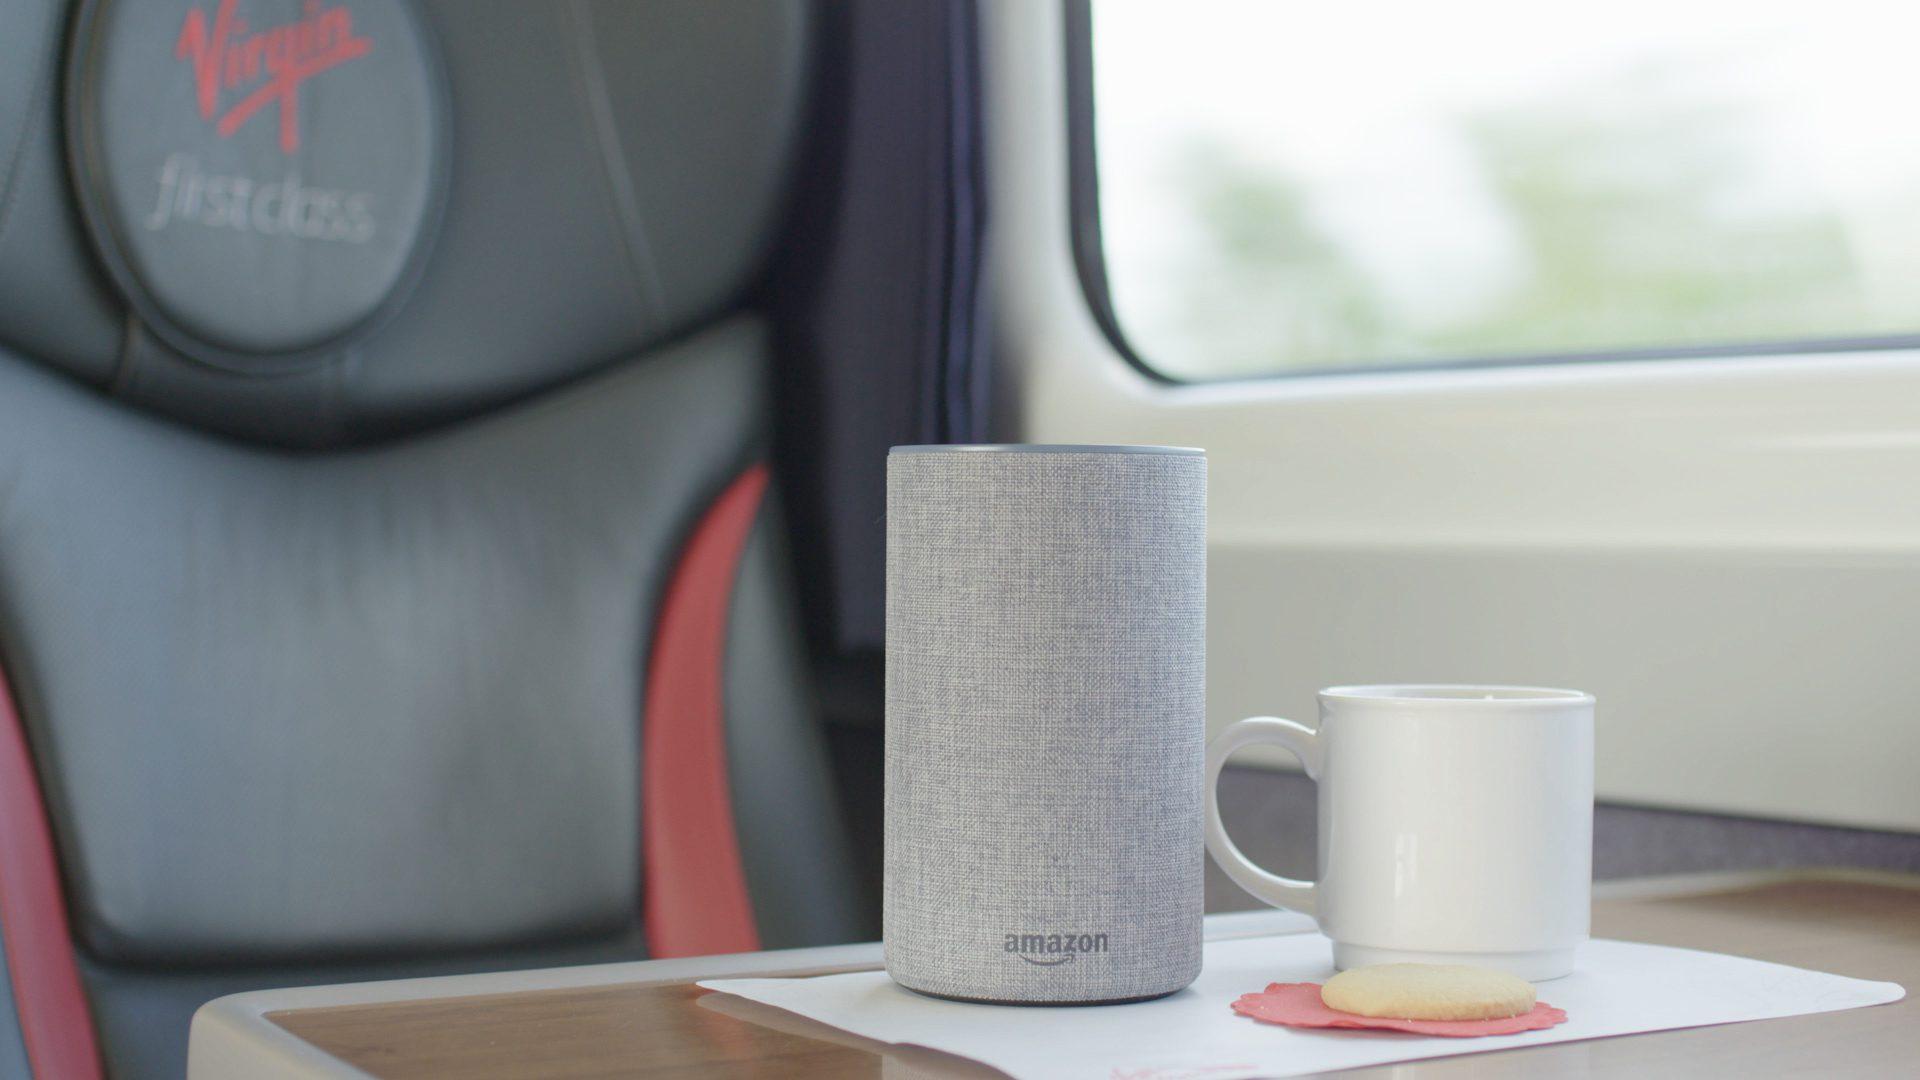 Virgin Trains and Amazon Alexa